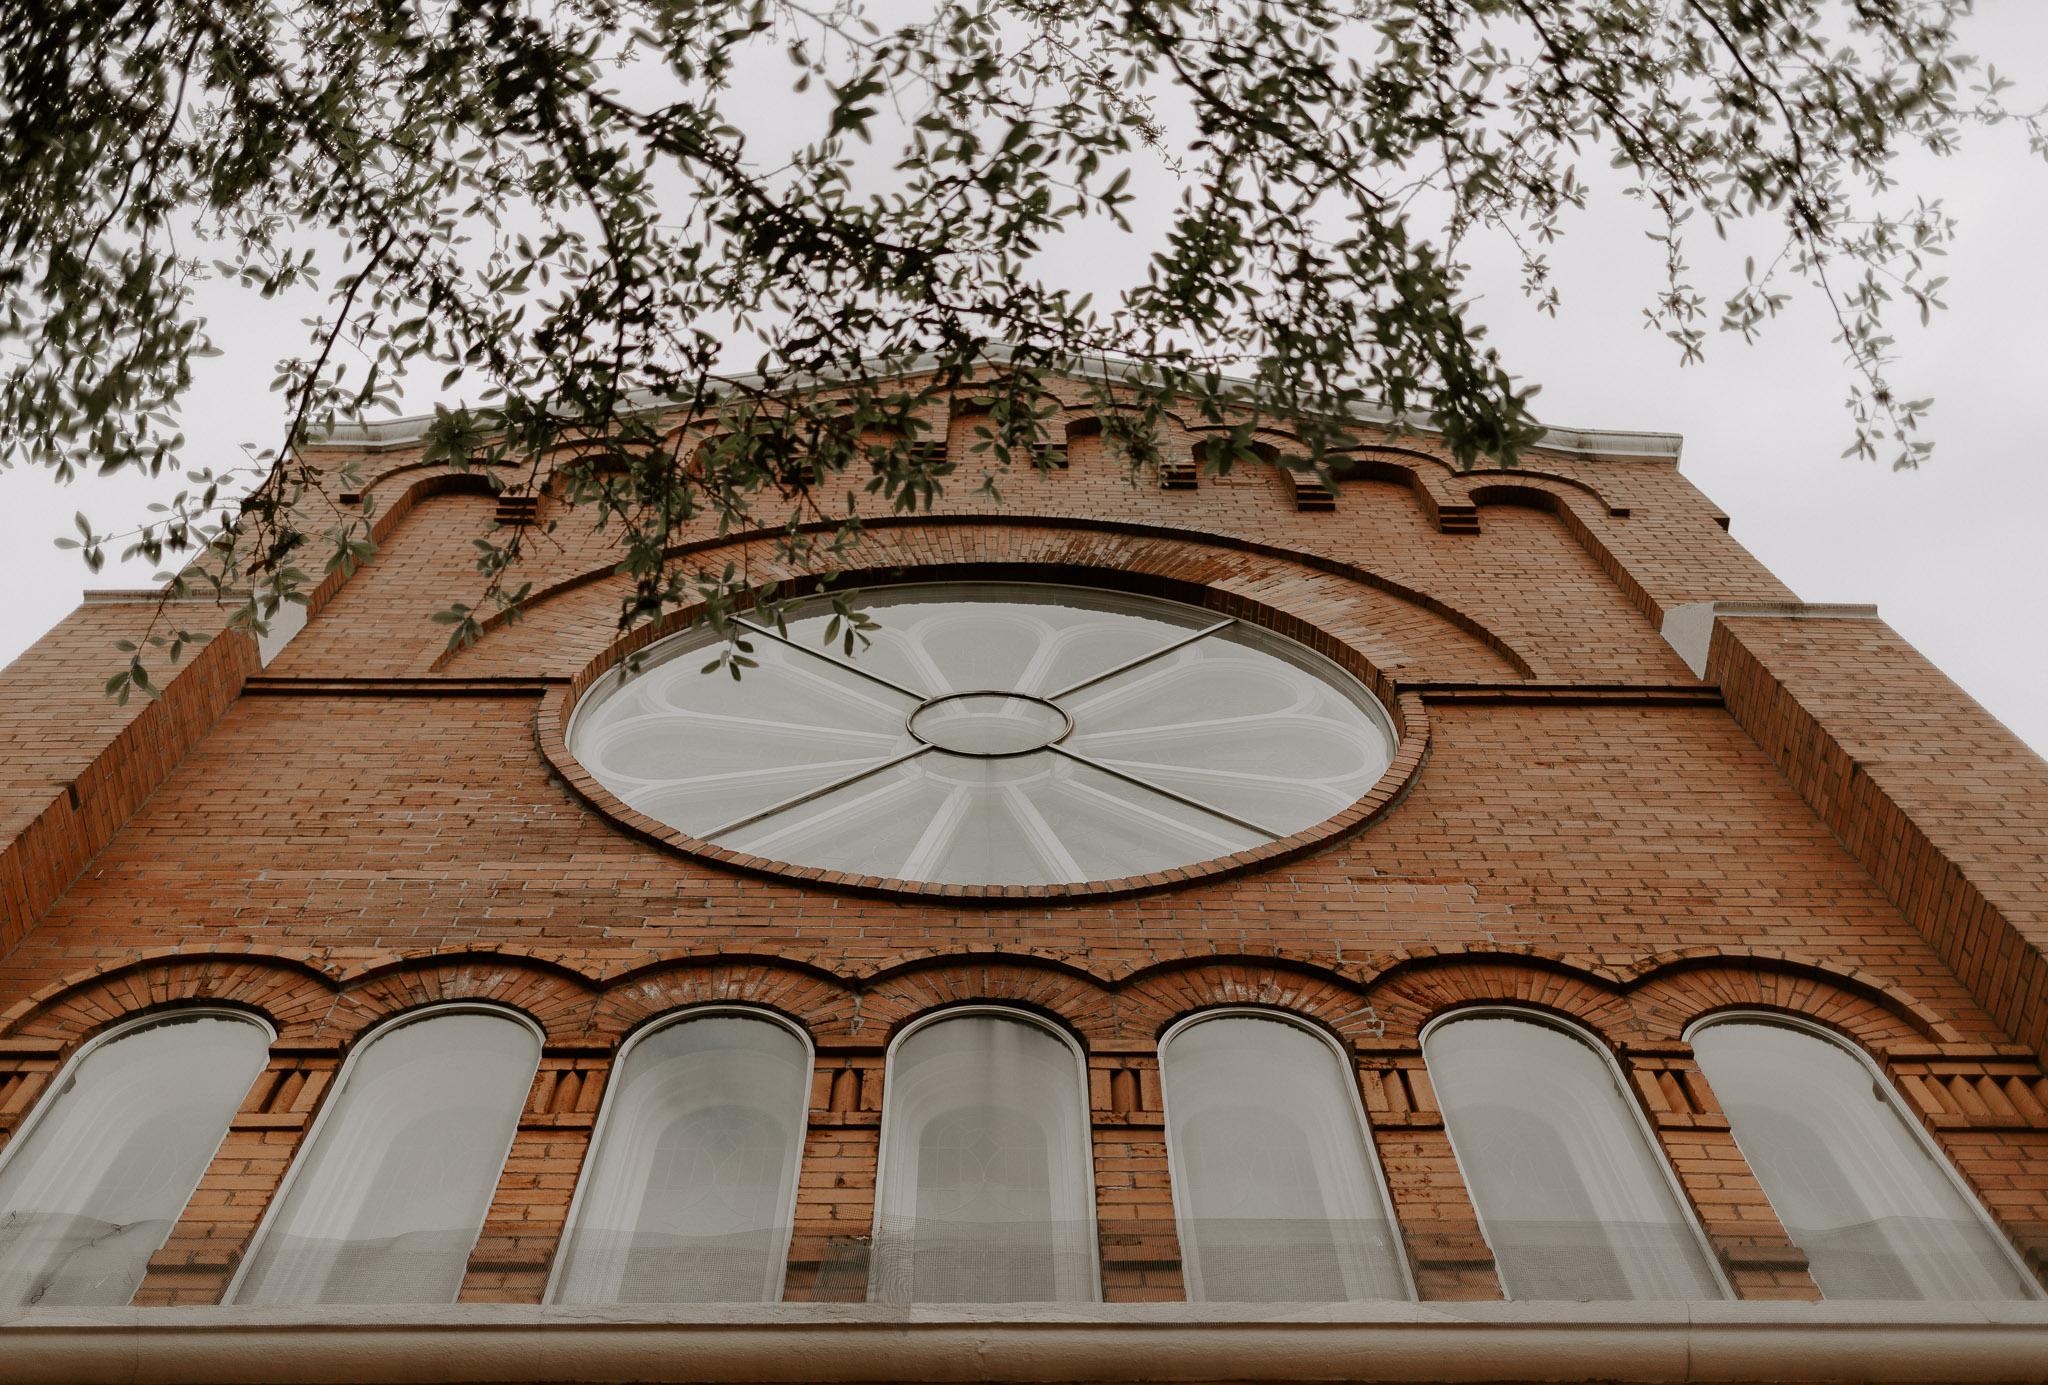 Catholic Houston Texas Flare Wedding Bell Tower-7516.jpg